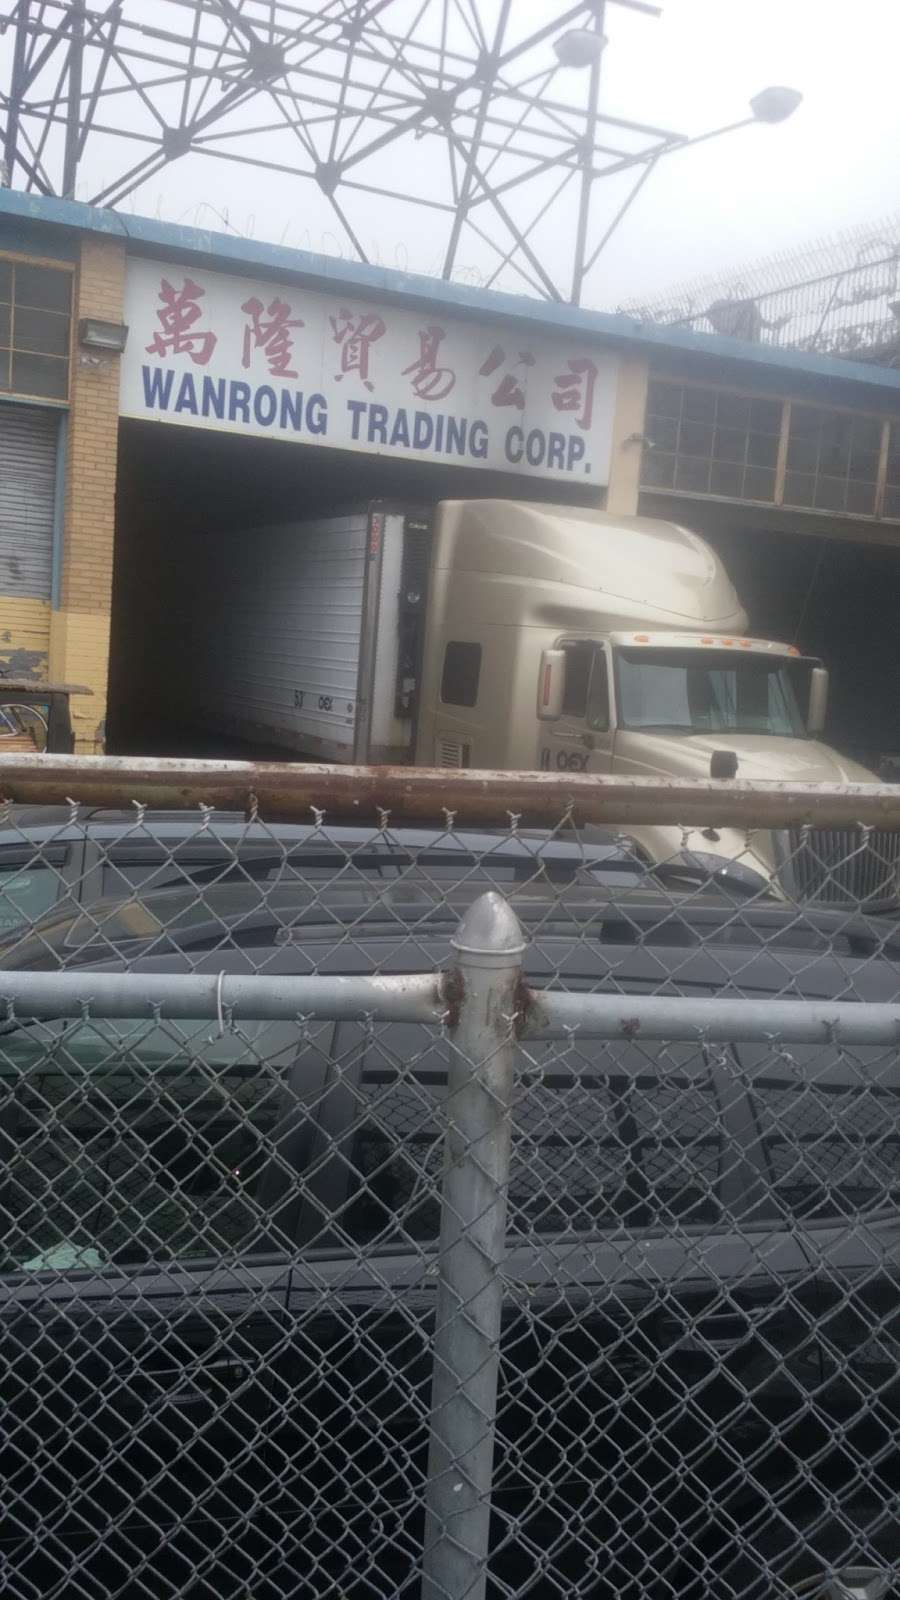 Wanrong Trading Truck Docks - storage  | Photo 10 of 10 | Address: 32-27-, 32-45 Hunters Point Ave, Long Island City, NY 11101, USA | Phone: (718) 361-8882